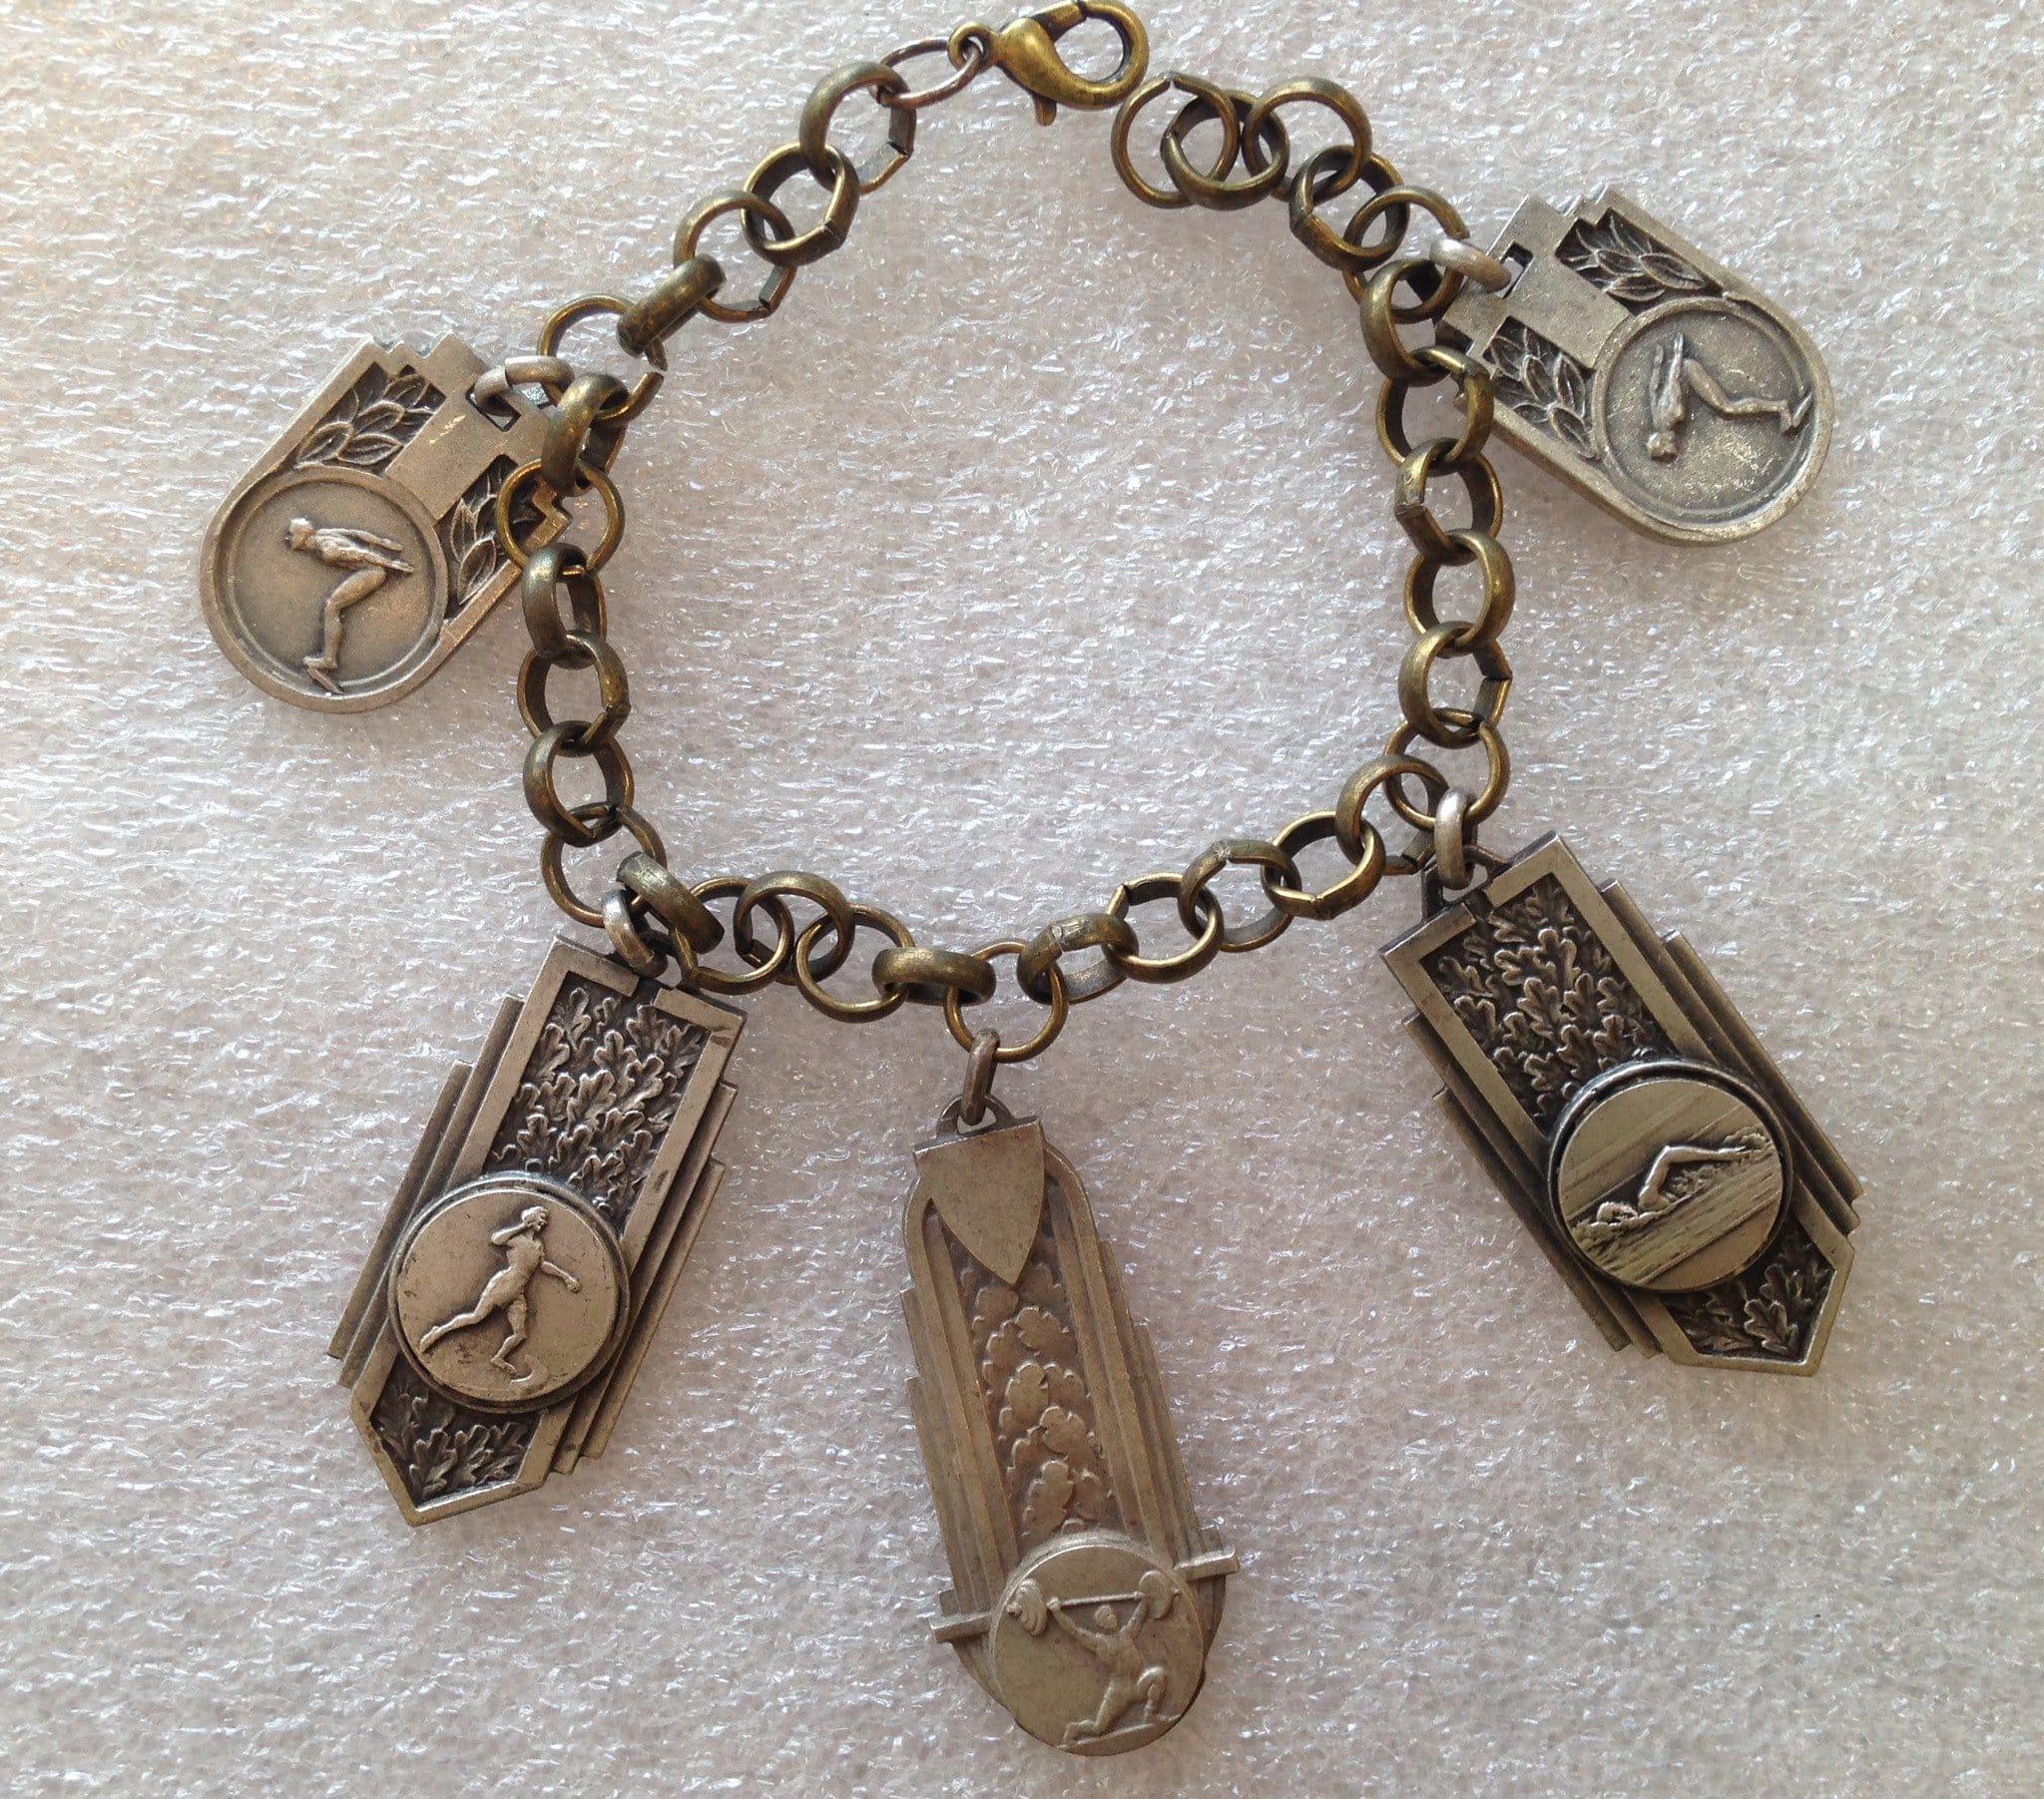 Vintage brass and silver-tone metal sports' medals bracelet